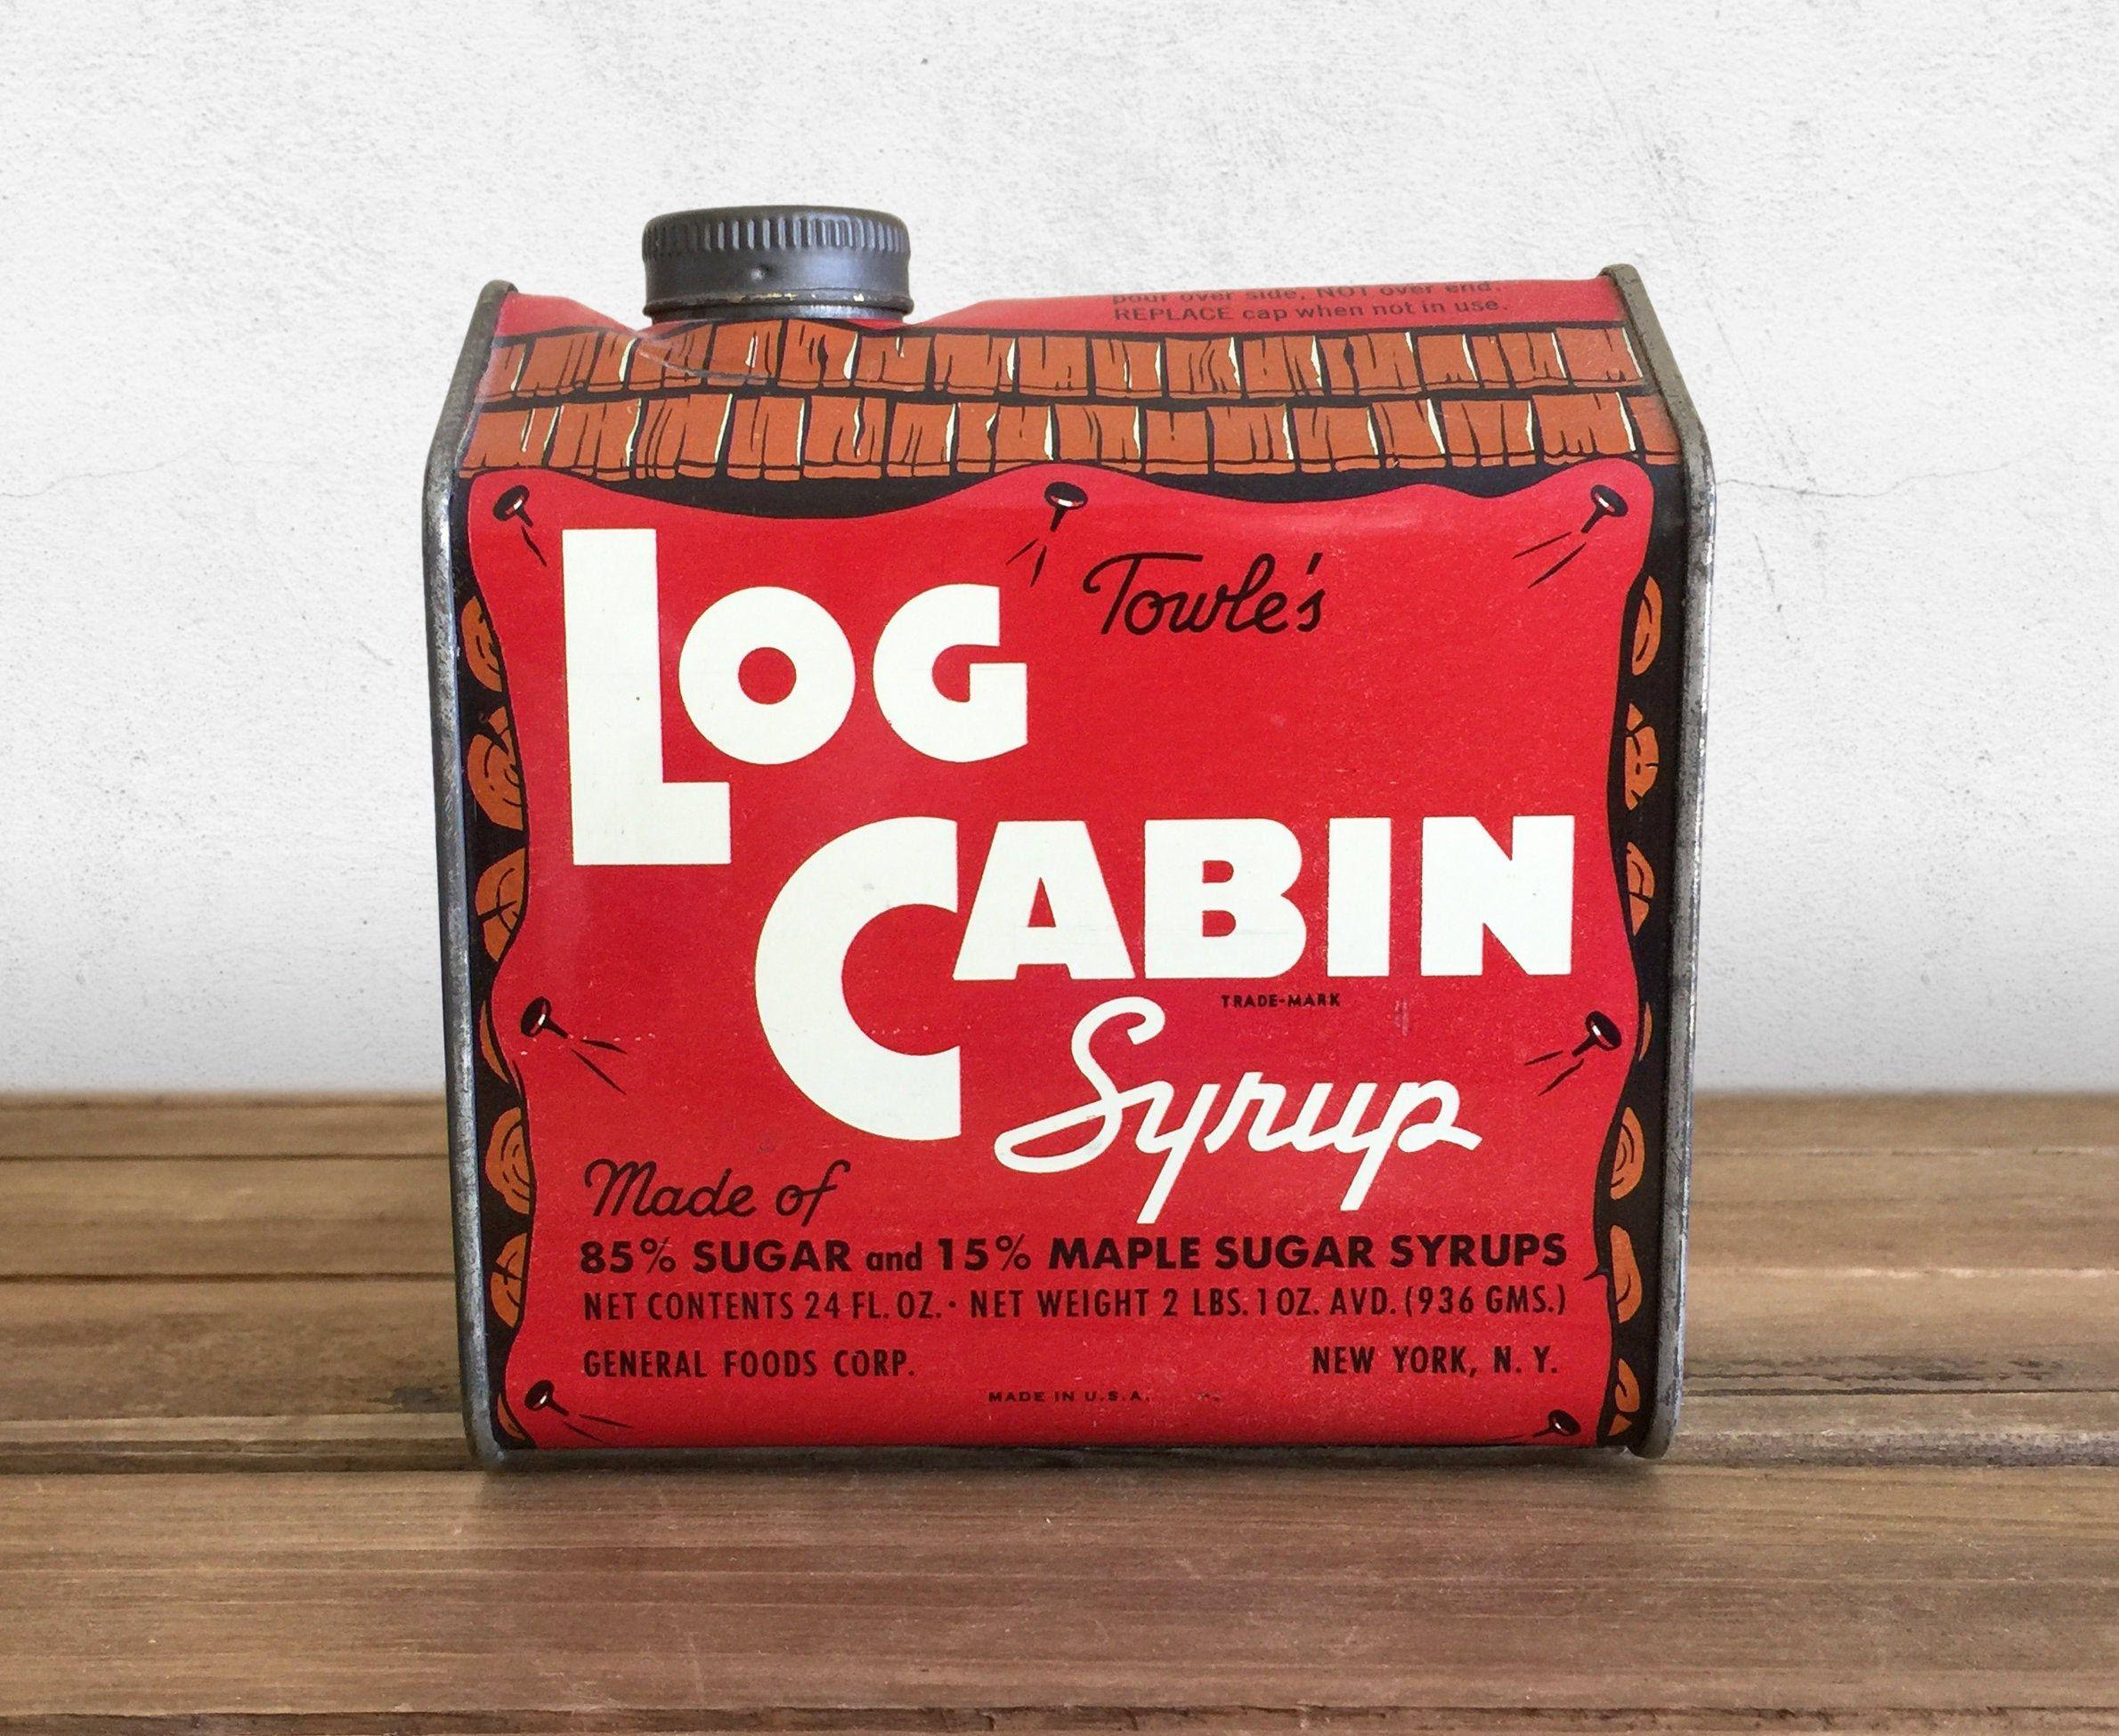 Vintage Towle S Log Cabin Syrup Tin 1940s Original 24 Oz Etsy In 2021 Vintage Tins Vintage Packaging Tin